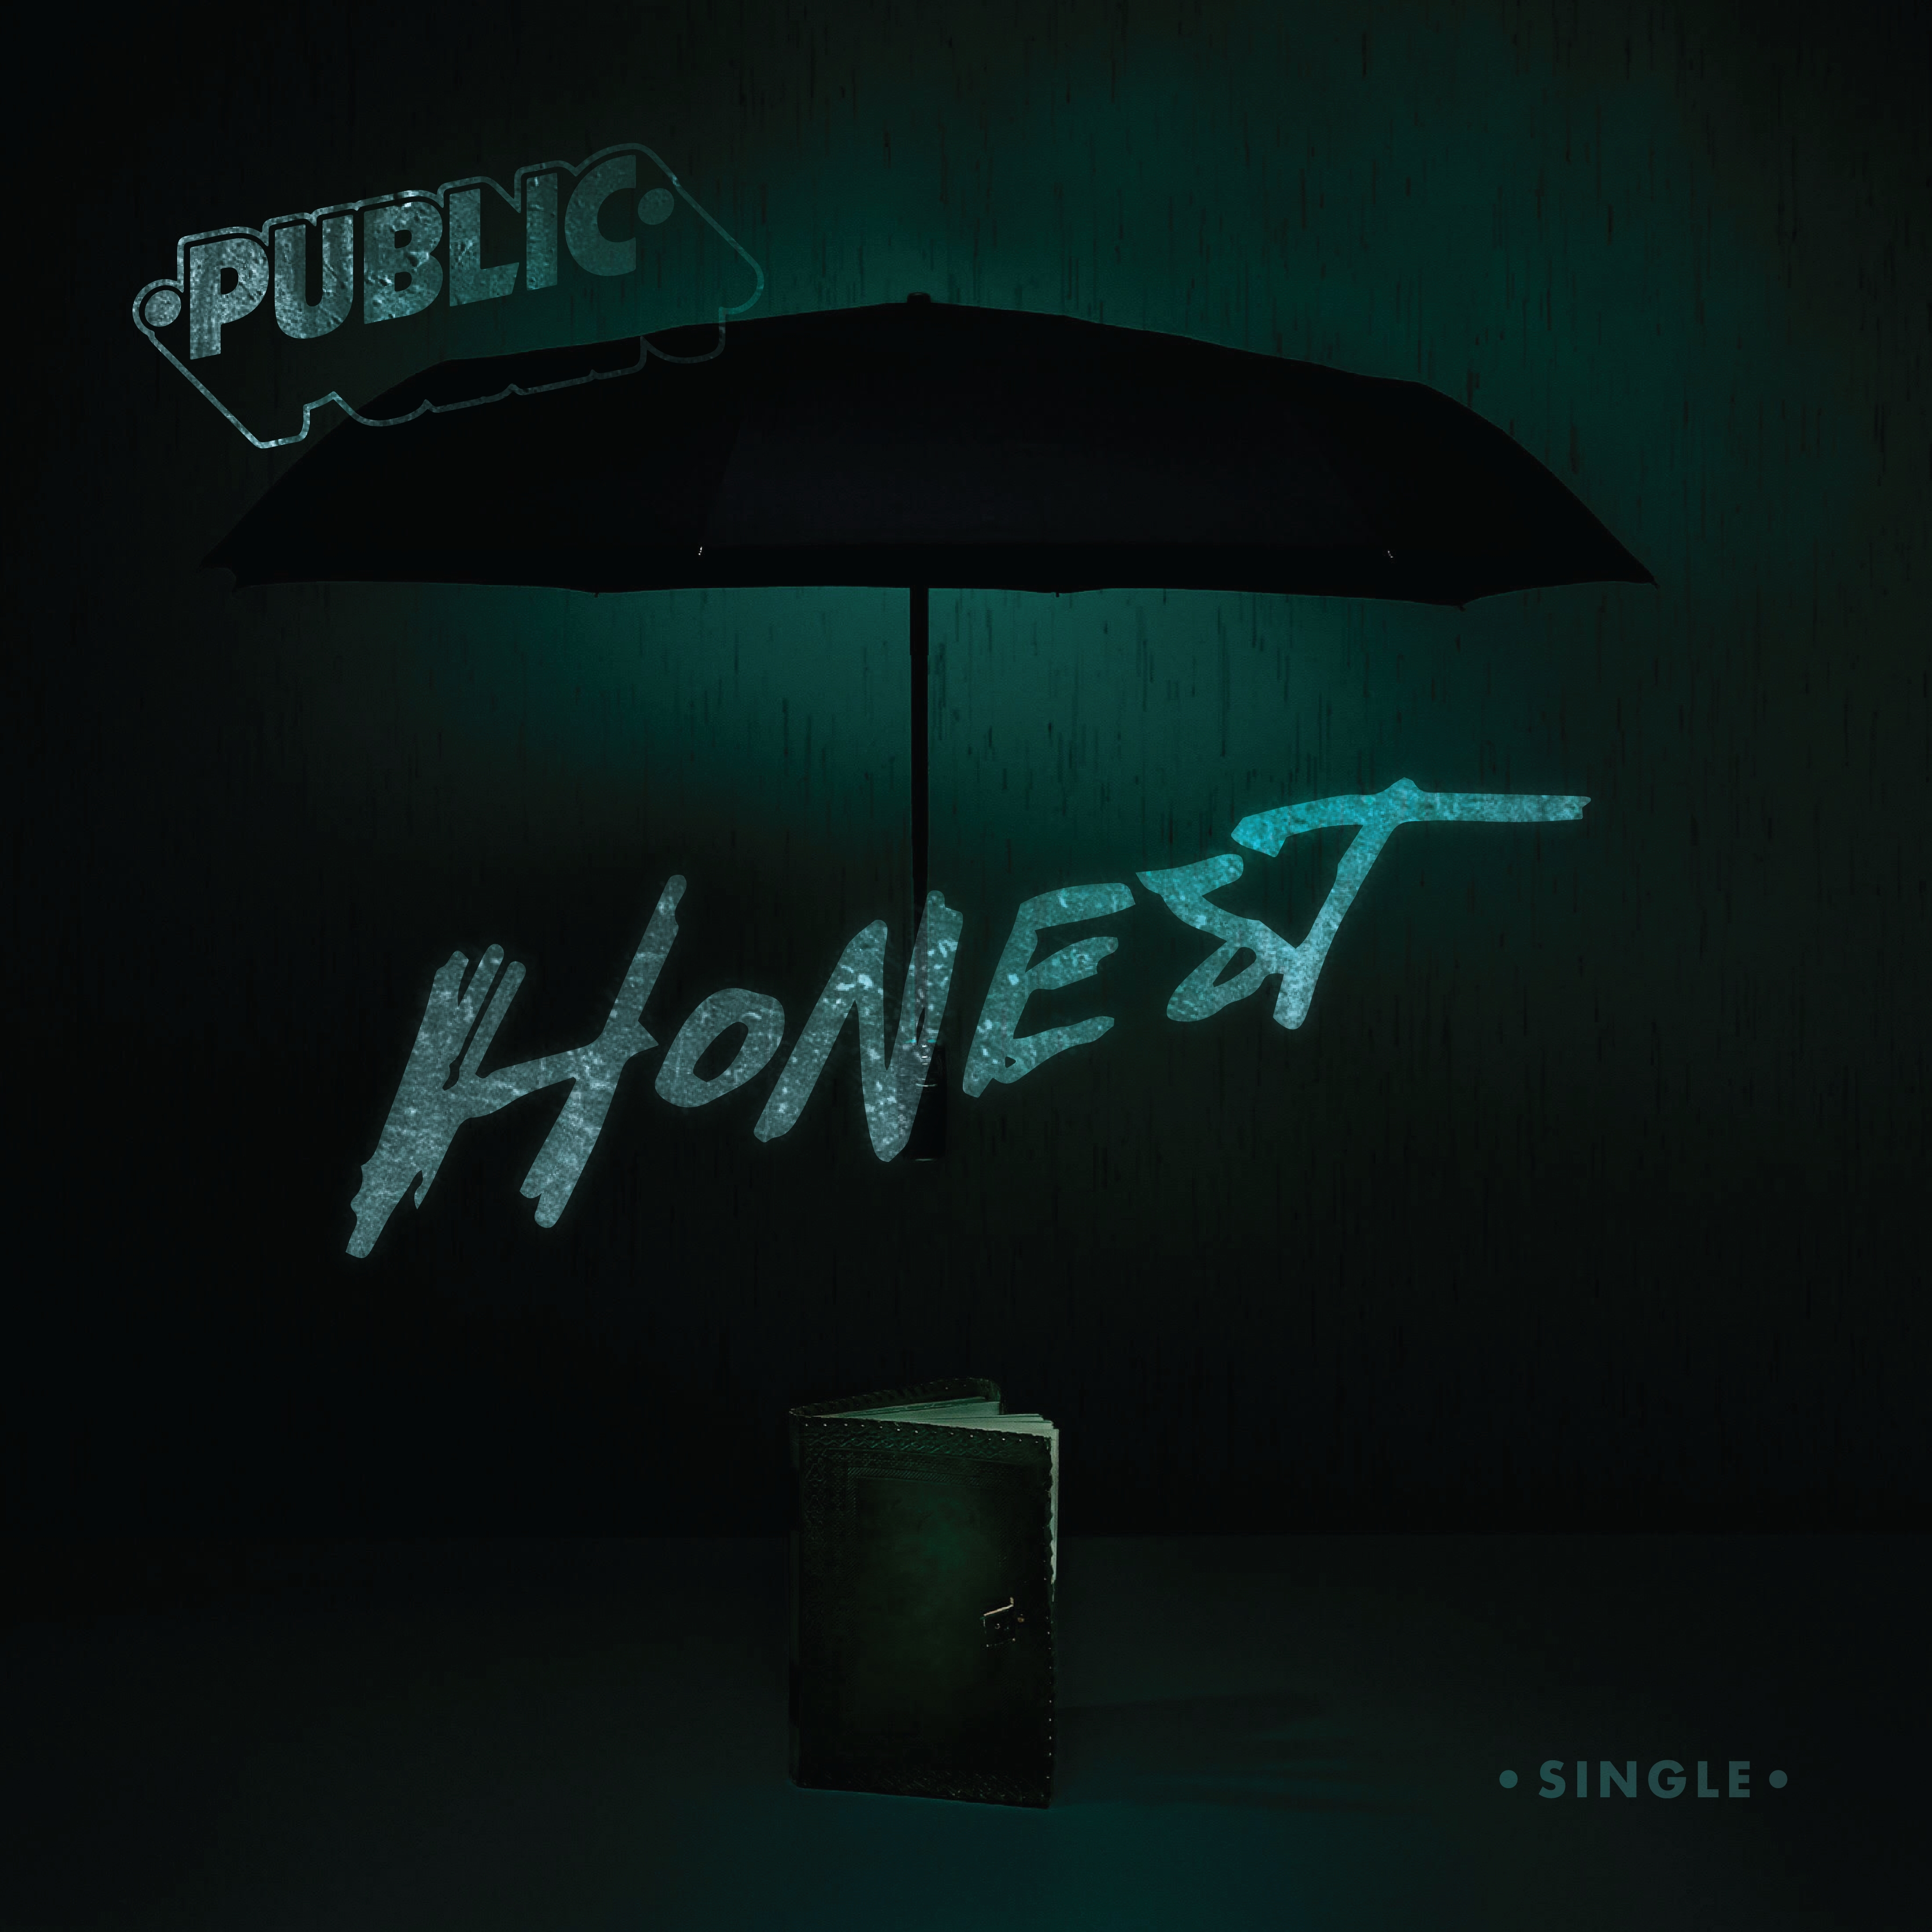 Honest - Single